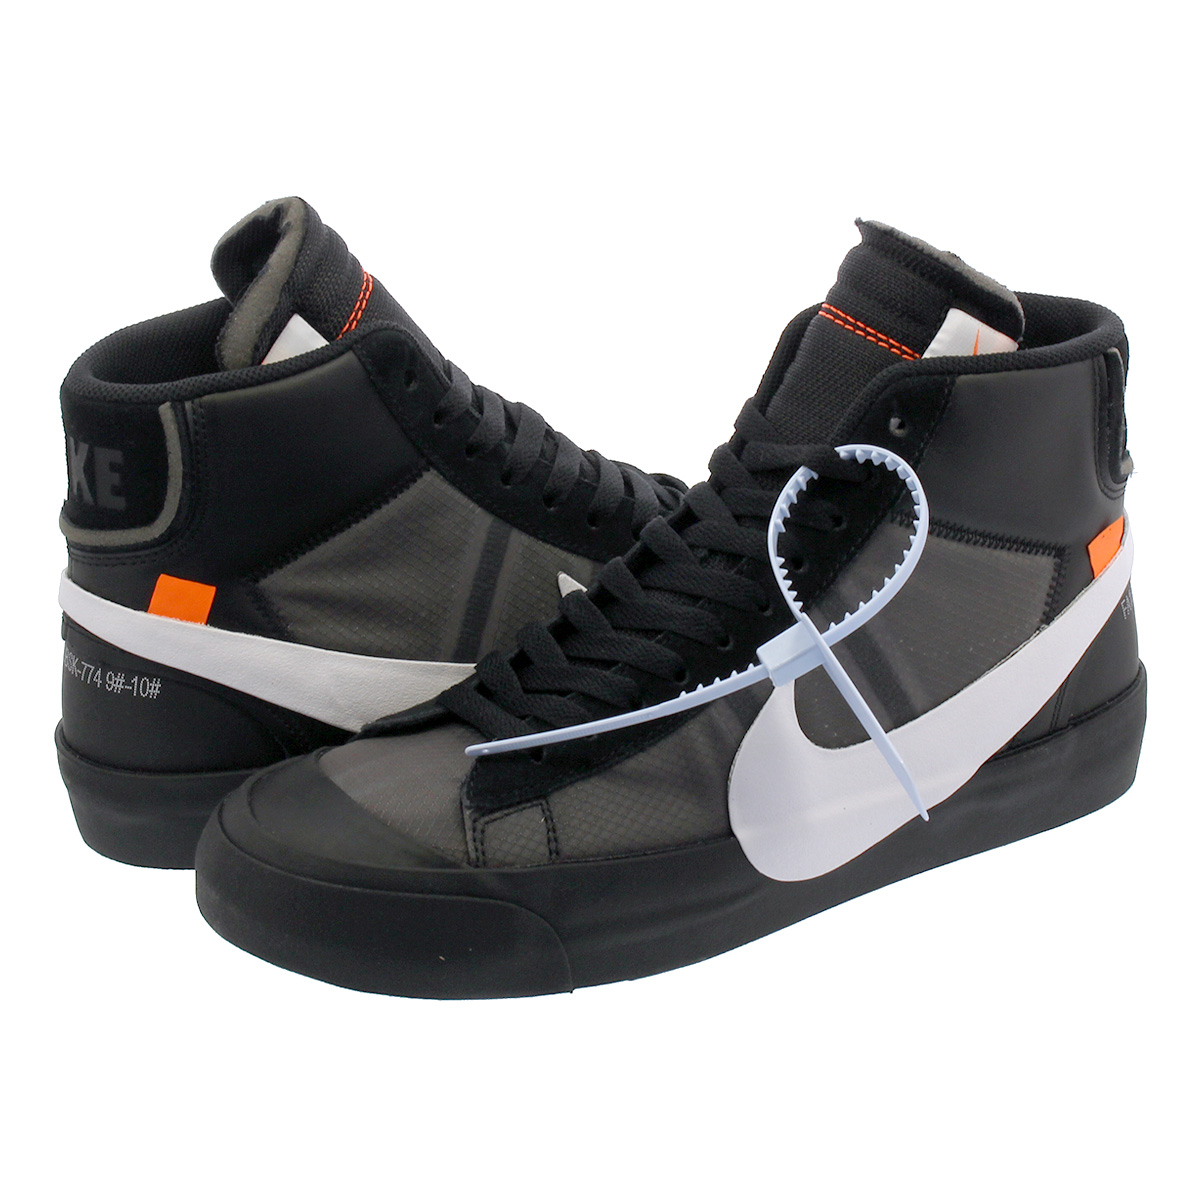 newest e7161 f5837 NIKE BLAZER MID Nike blazer mid-off white BLACK/WHITE aa3832-001